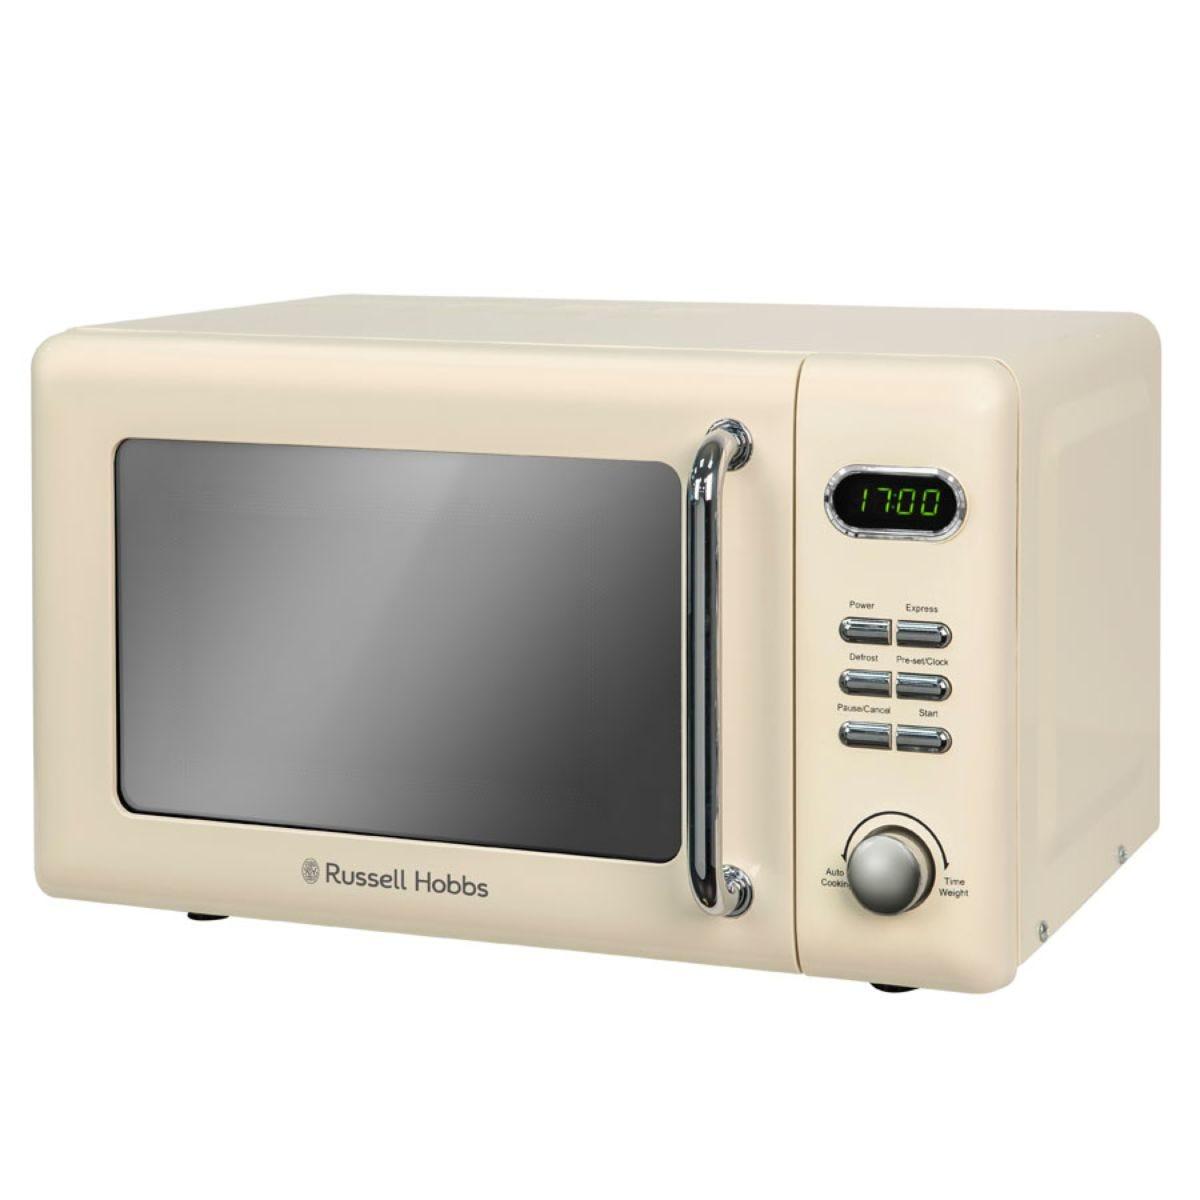 Russell Hobbs 700W 17L Retro Digital Microwave - Cream